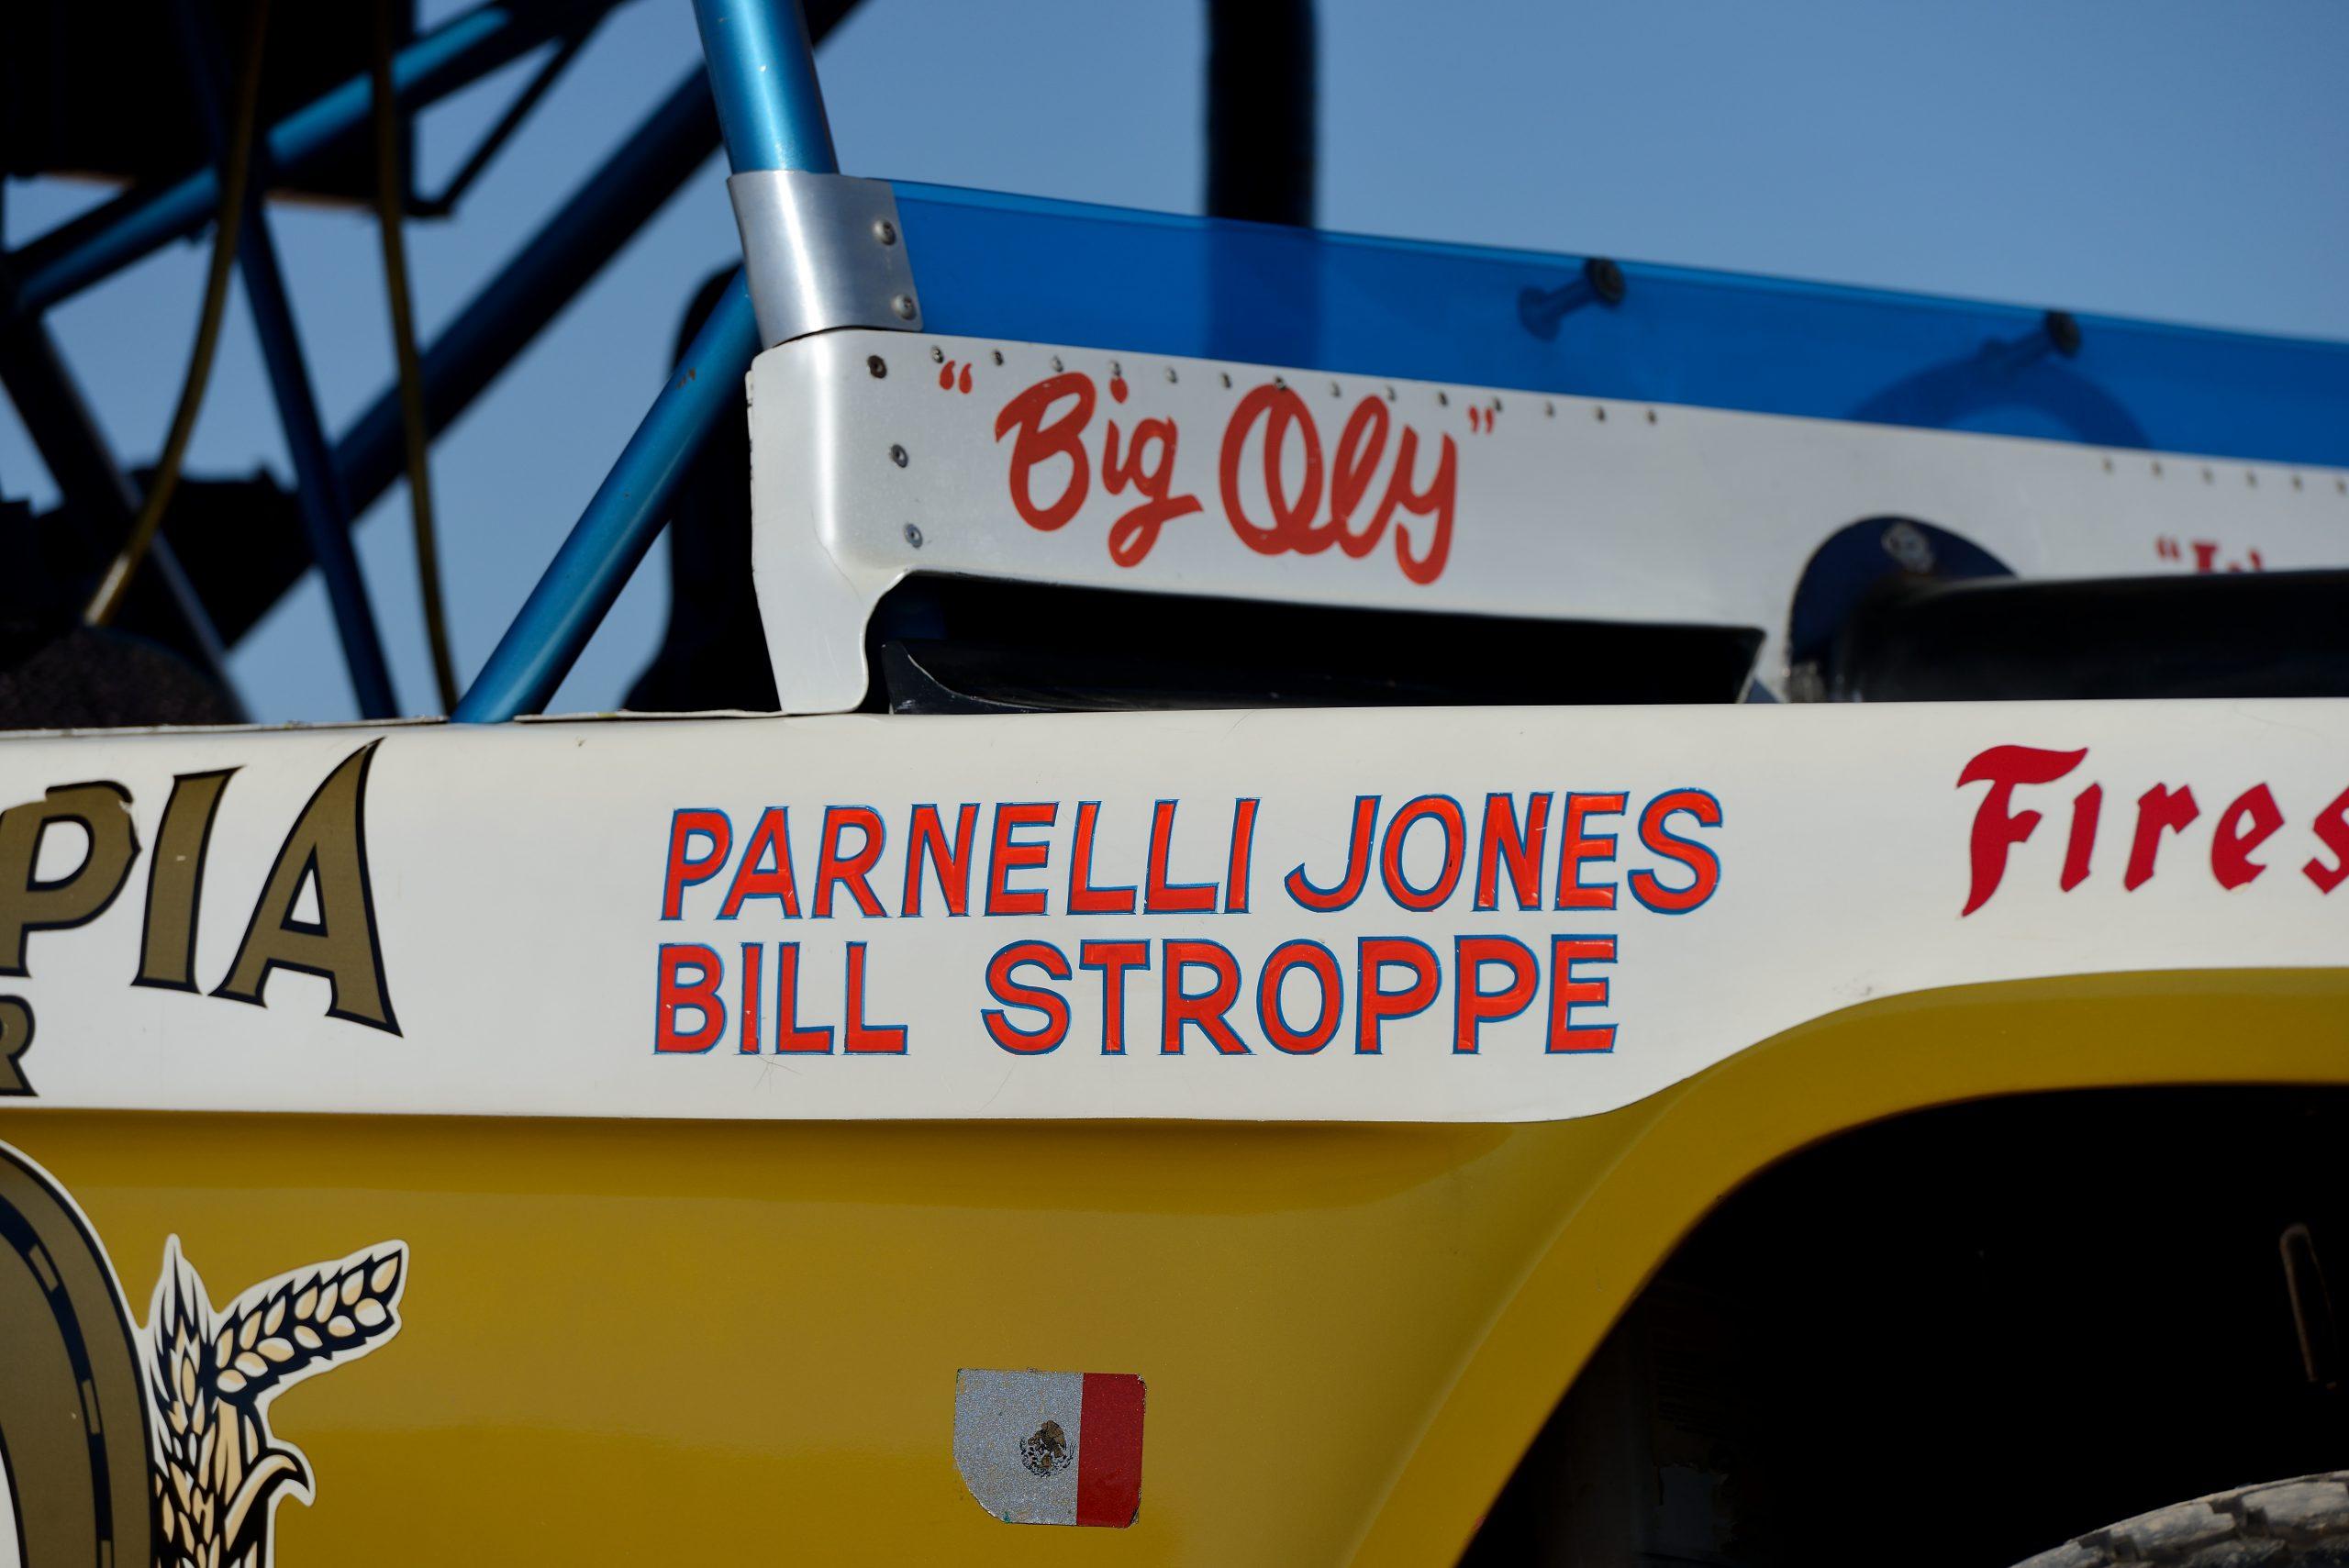 Big Oly Bronco parnelli jones